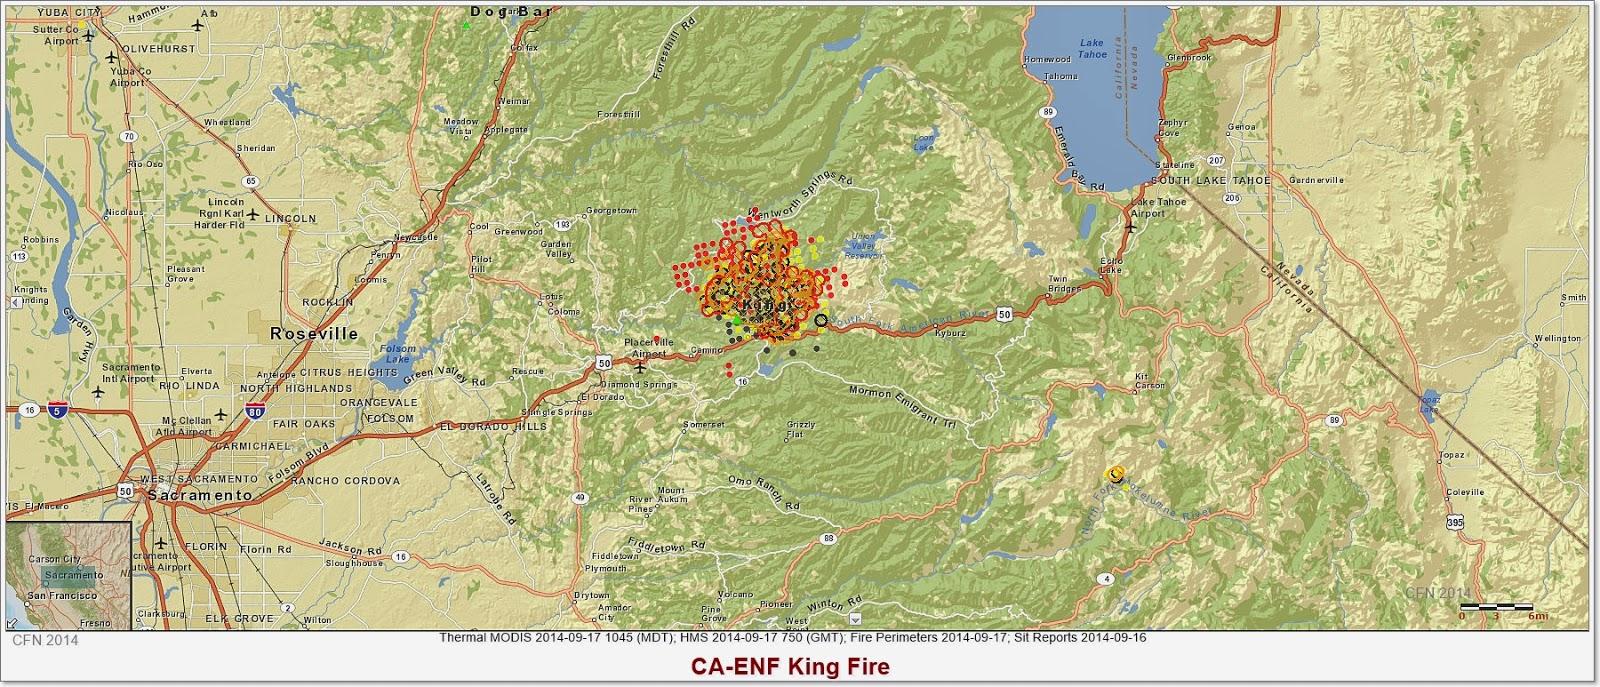 CFN - CALIFORNIA FIRE NEWS - CAL FIRE NEWS : CA-ENF King ...